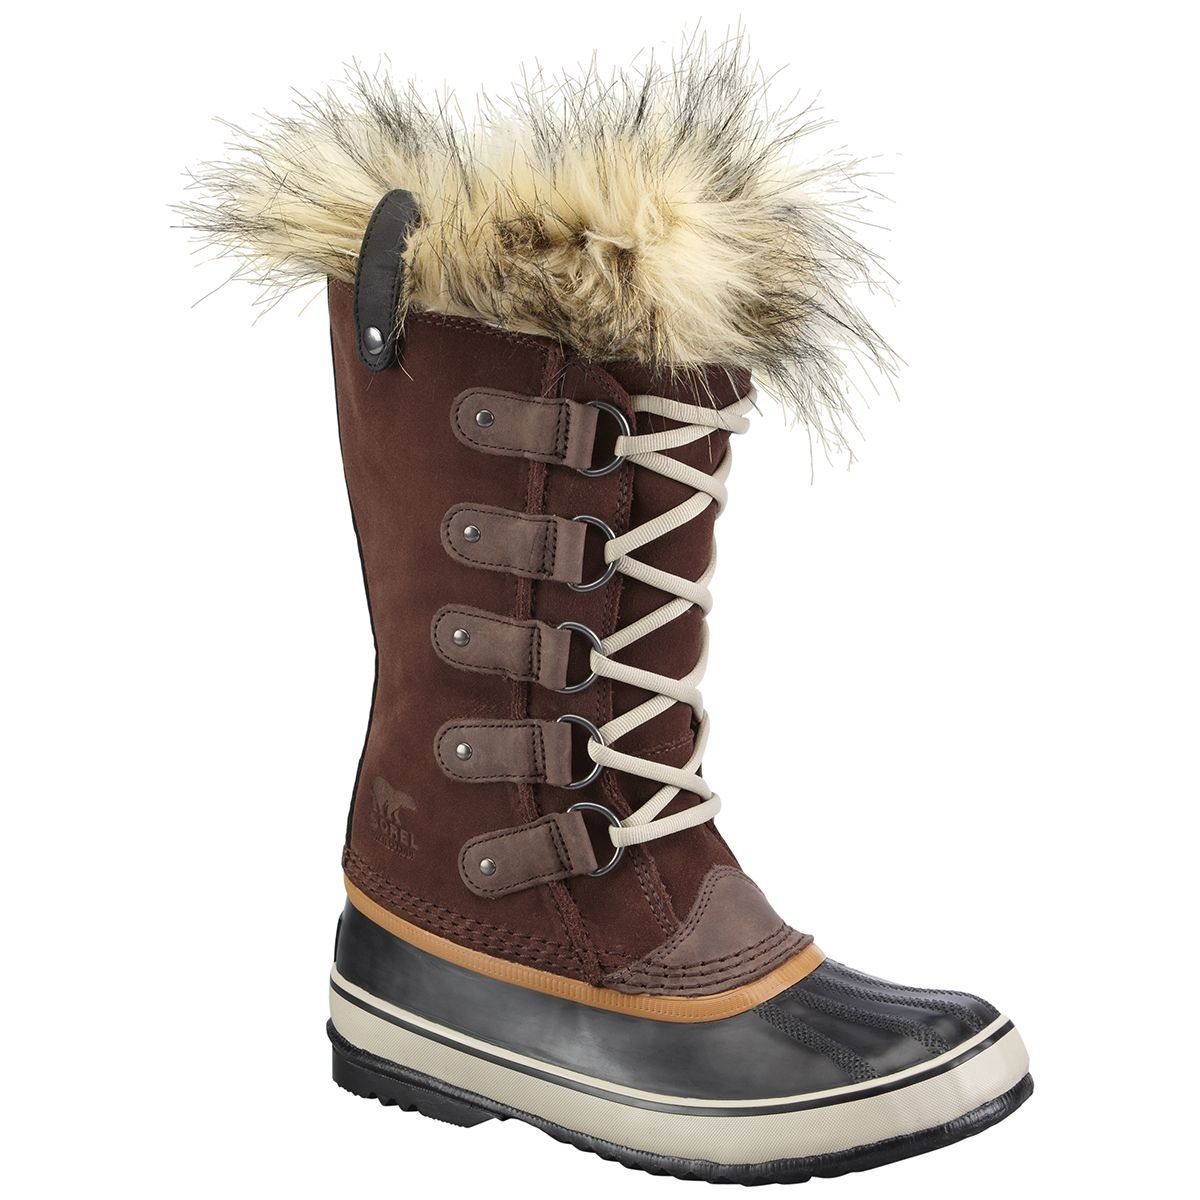 SOREL Women's Joan of Arctic Winter Boots, Tobacco - Eastern Mountain Sports